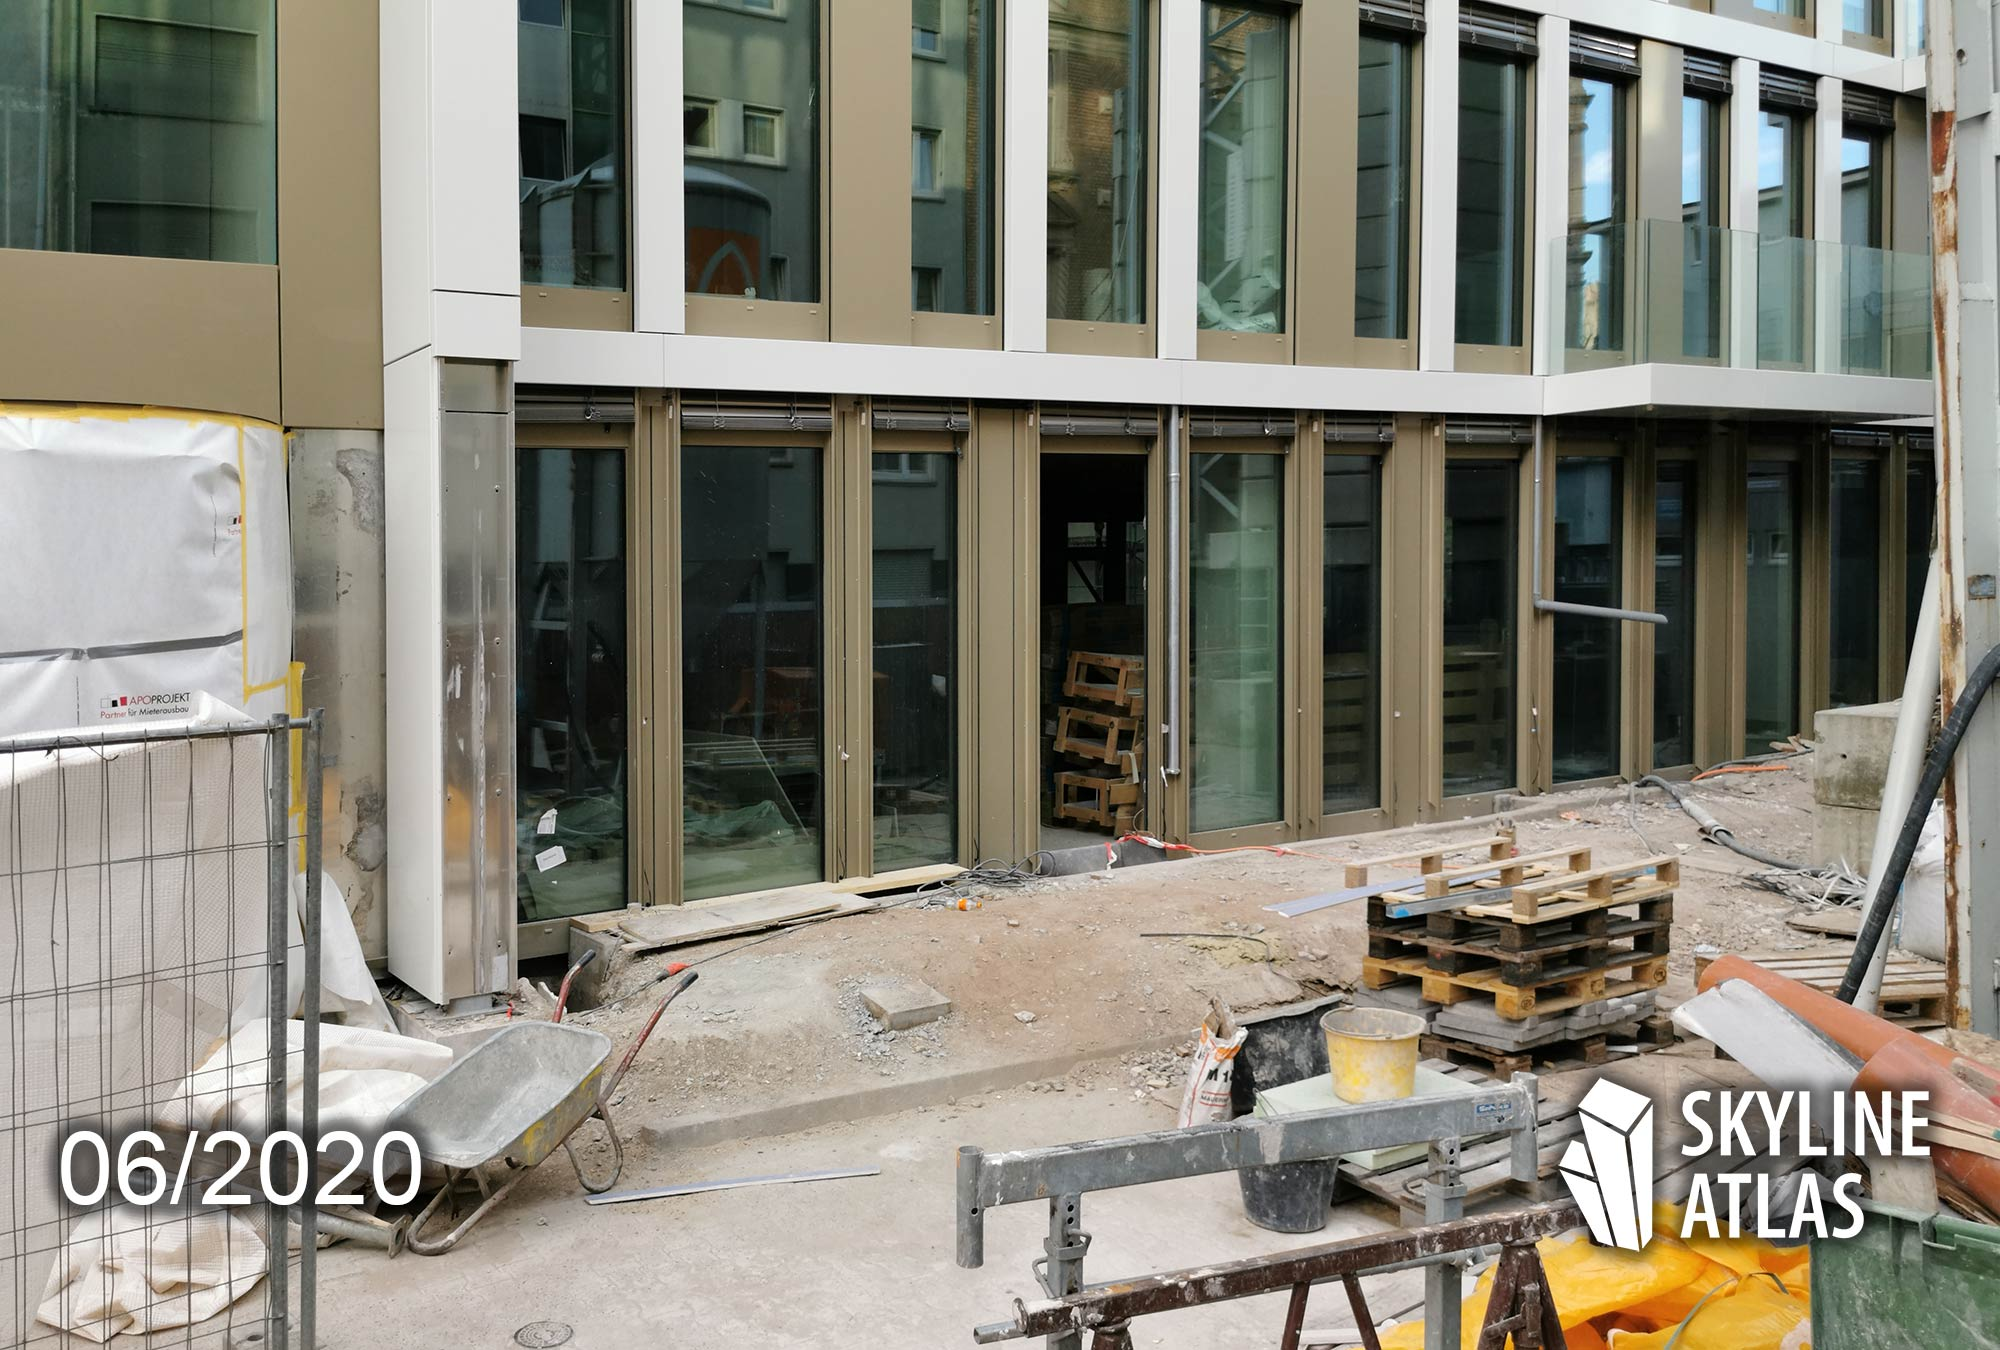 MORROW Frankfurt am Main - Fassade - Bürohaus Westend Frankfurt - Baustelle Morrow - Bauarbiten im Sommer 2020